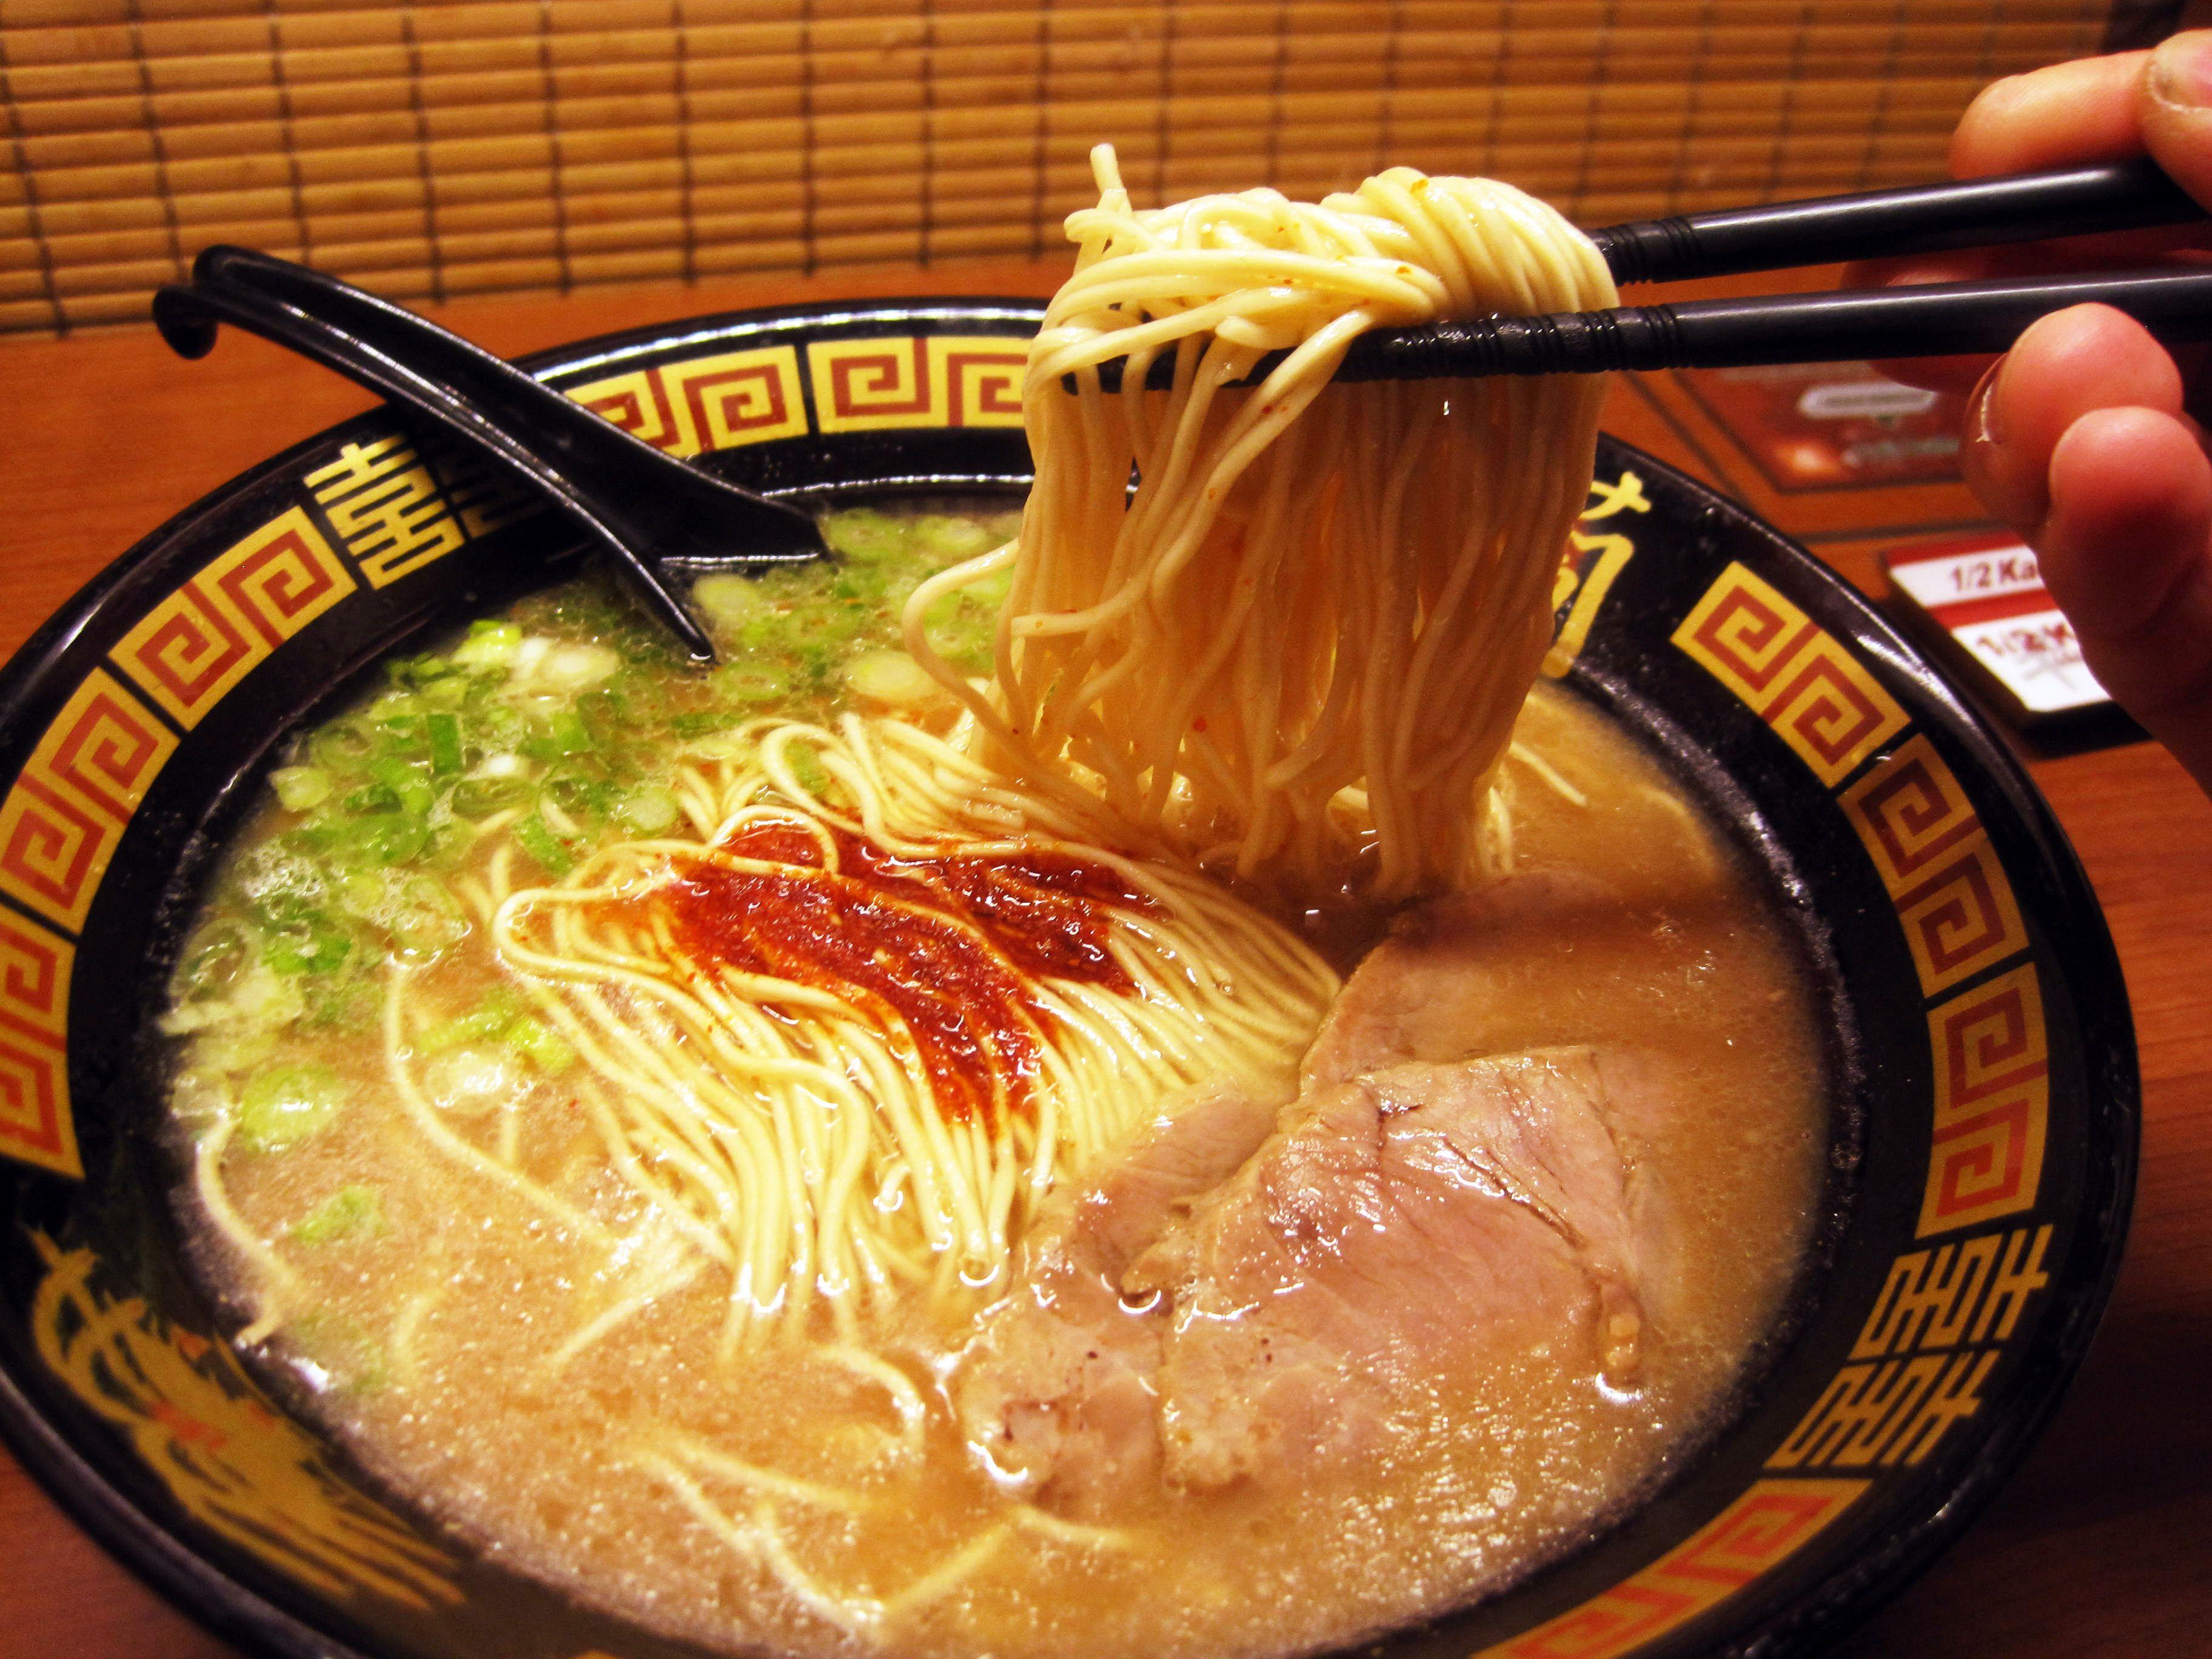 Trik Makan Ramen Ala Orang Jepang